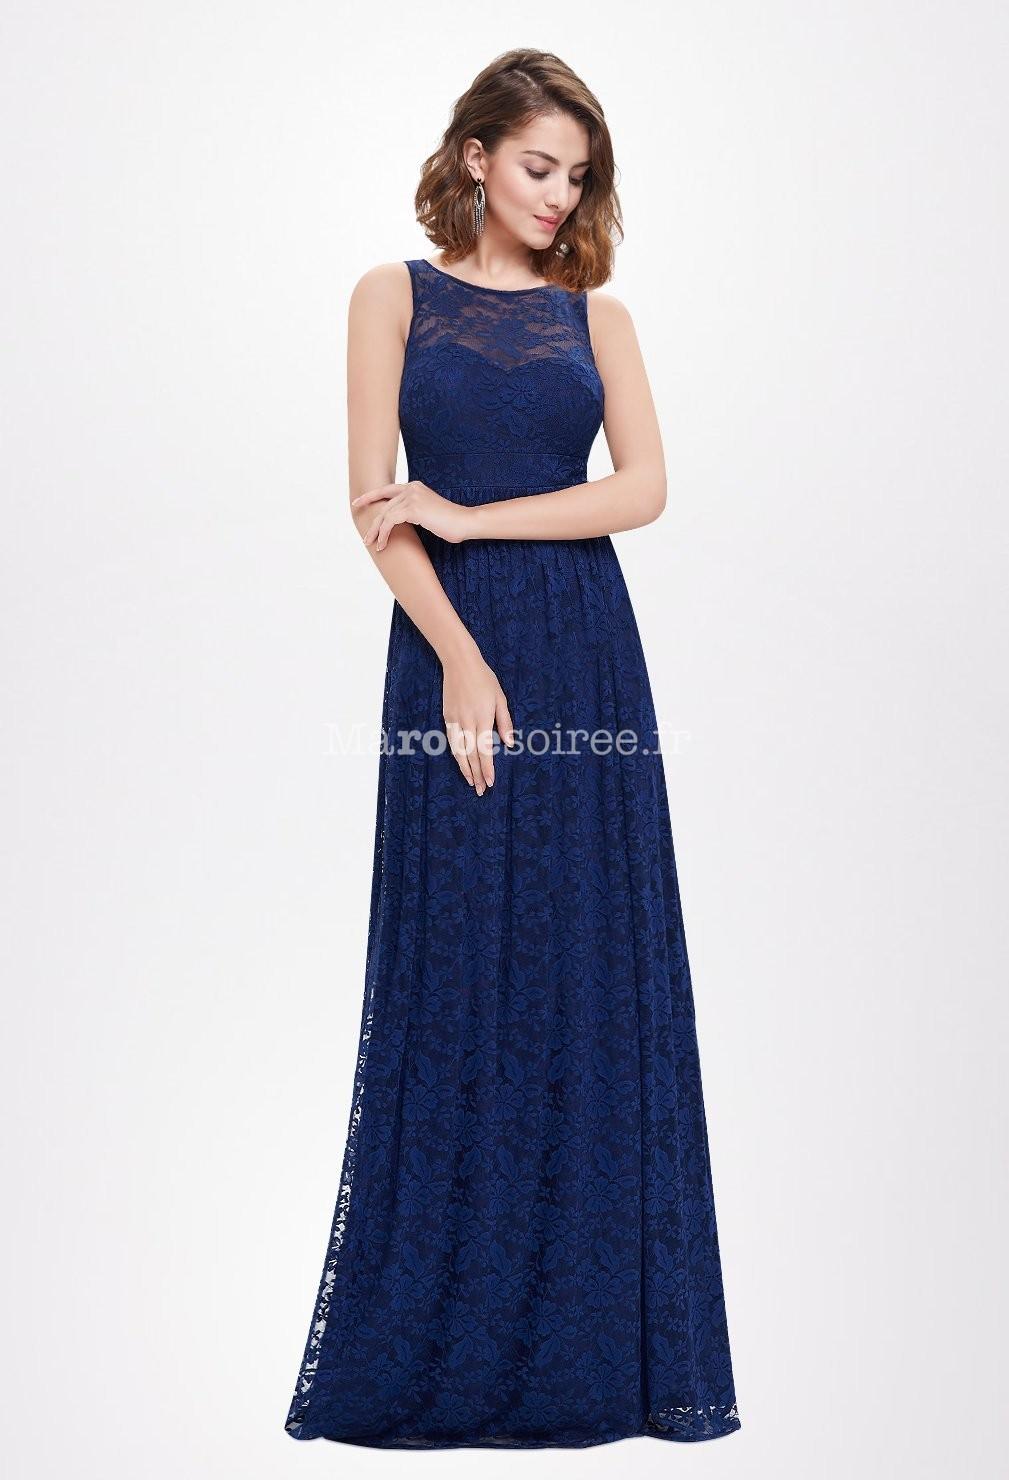 somptueuse robe de c r monie bleu nuit